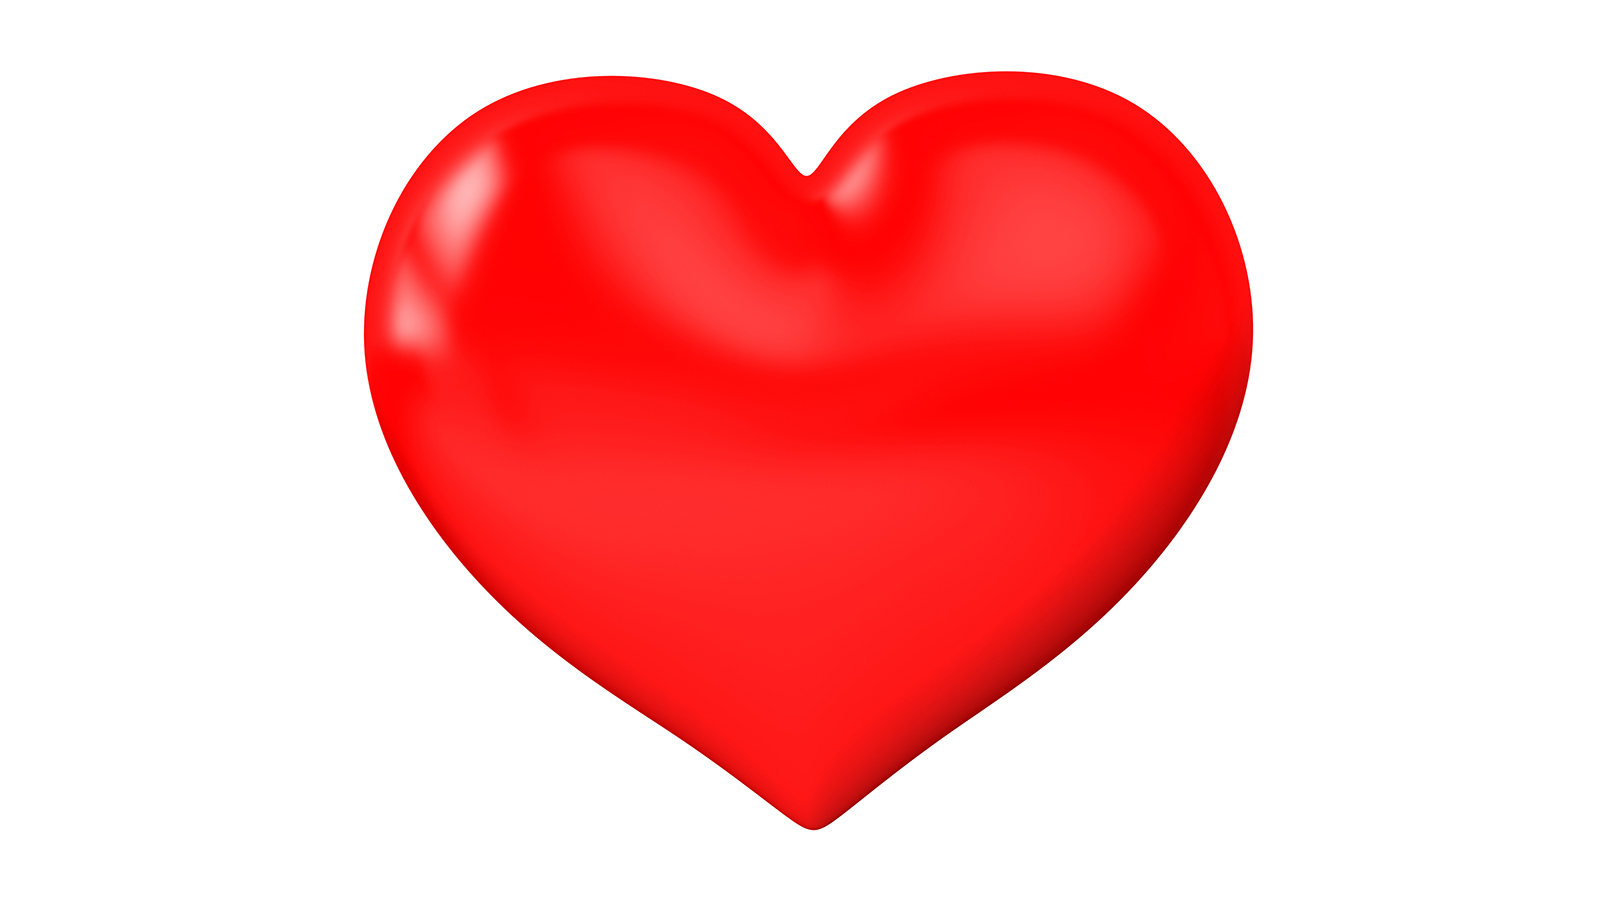 Awesome Heart Photo